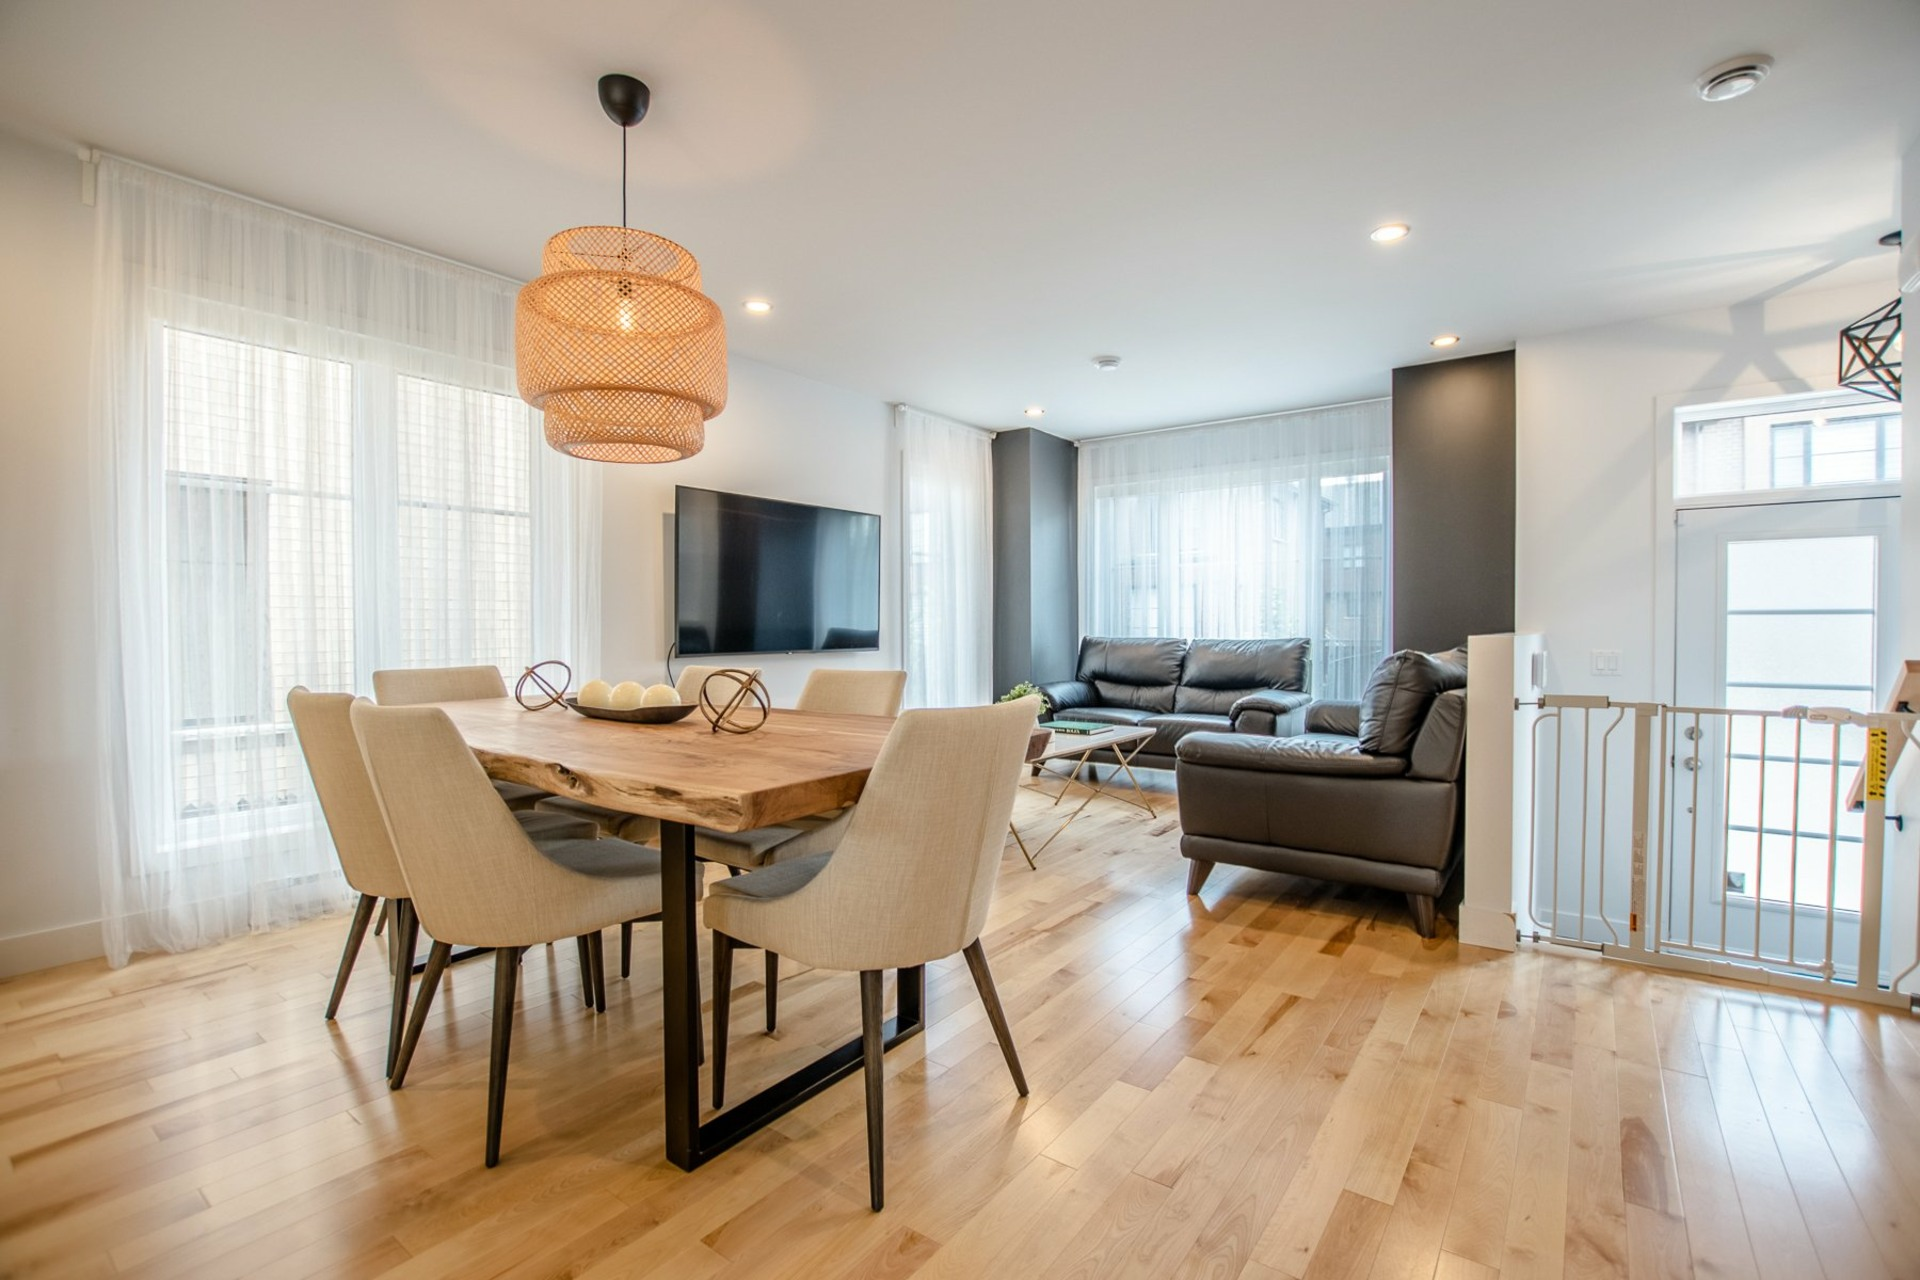 image 5 - MX - Casa sola - MX En venta Saint-Constant - 10 habitaciones